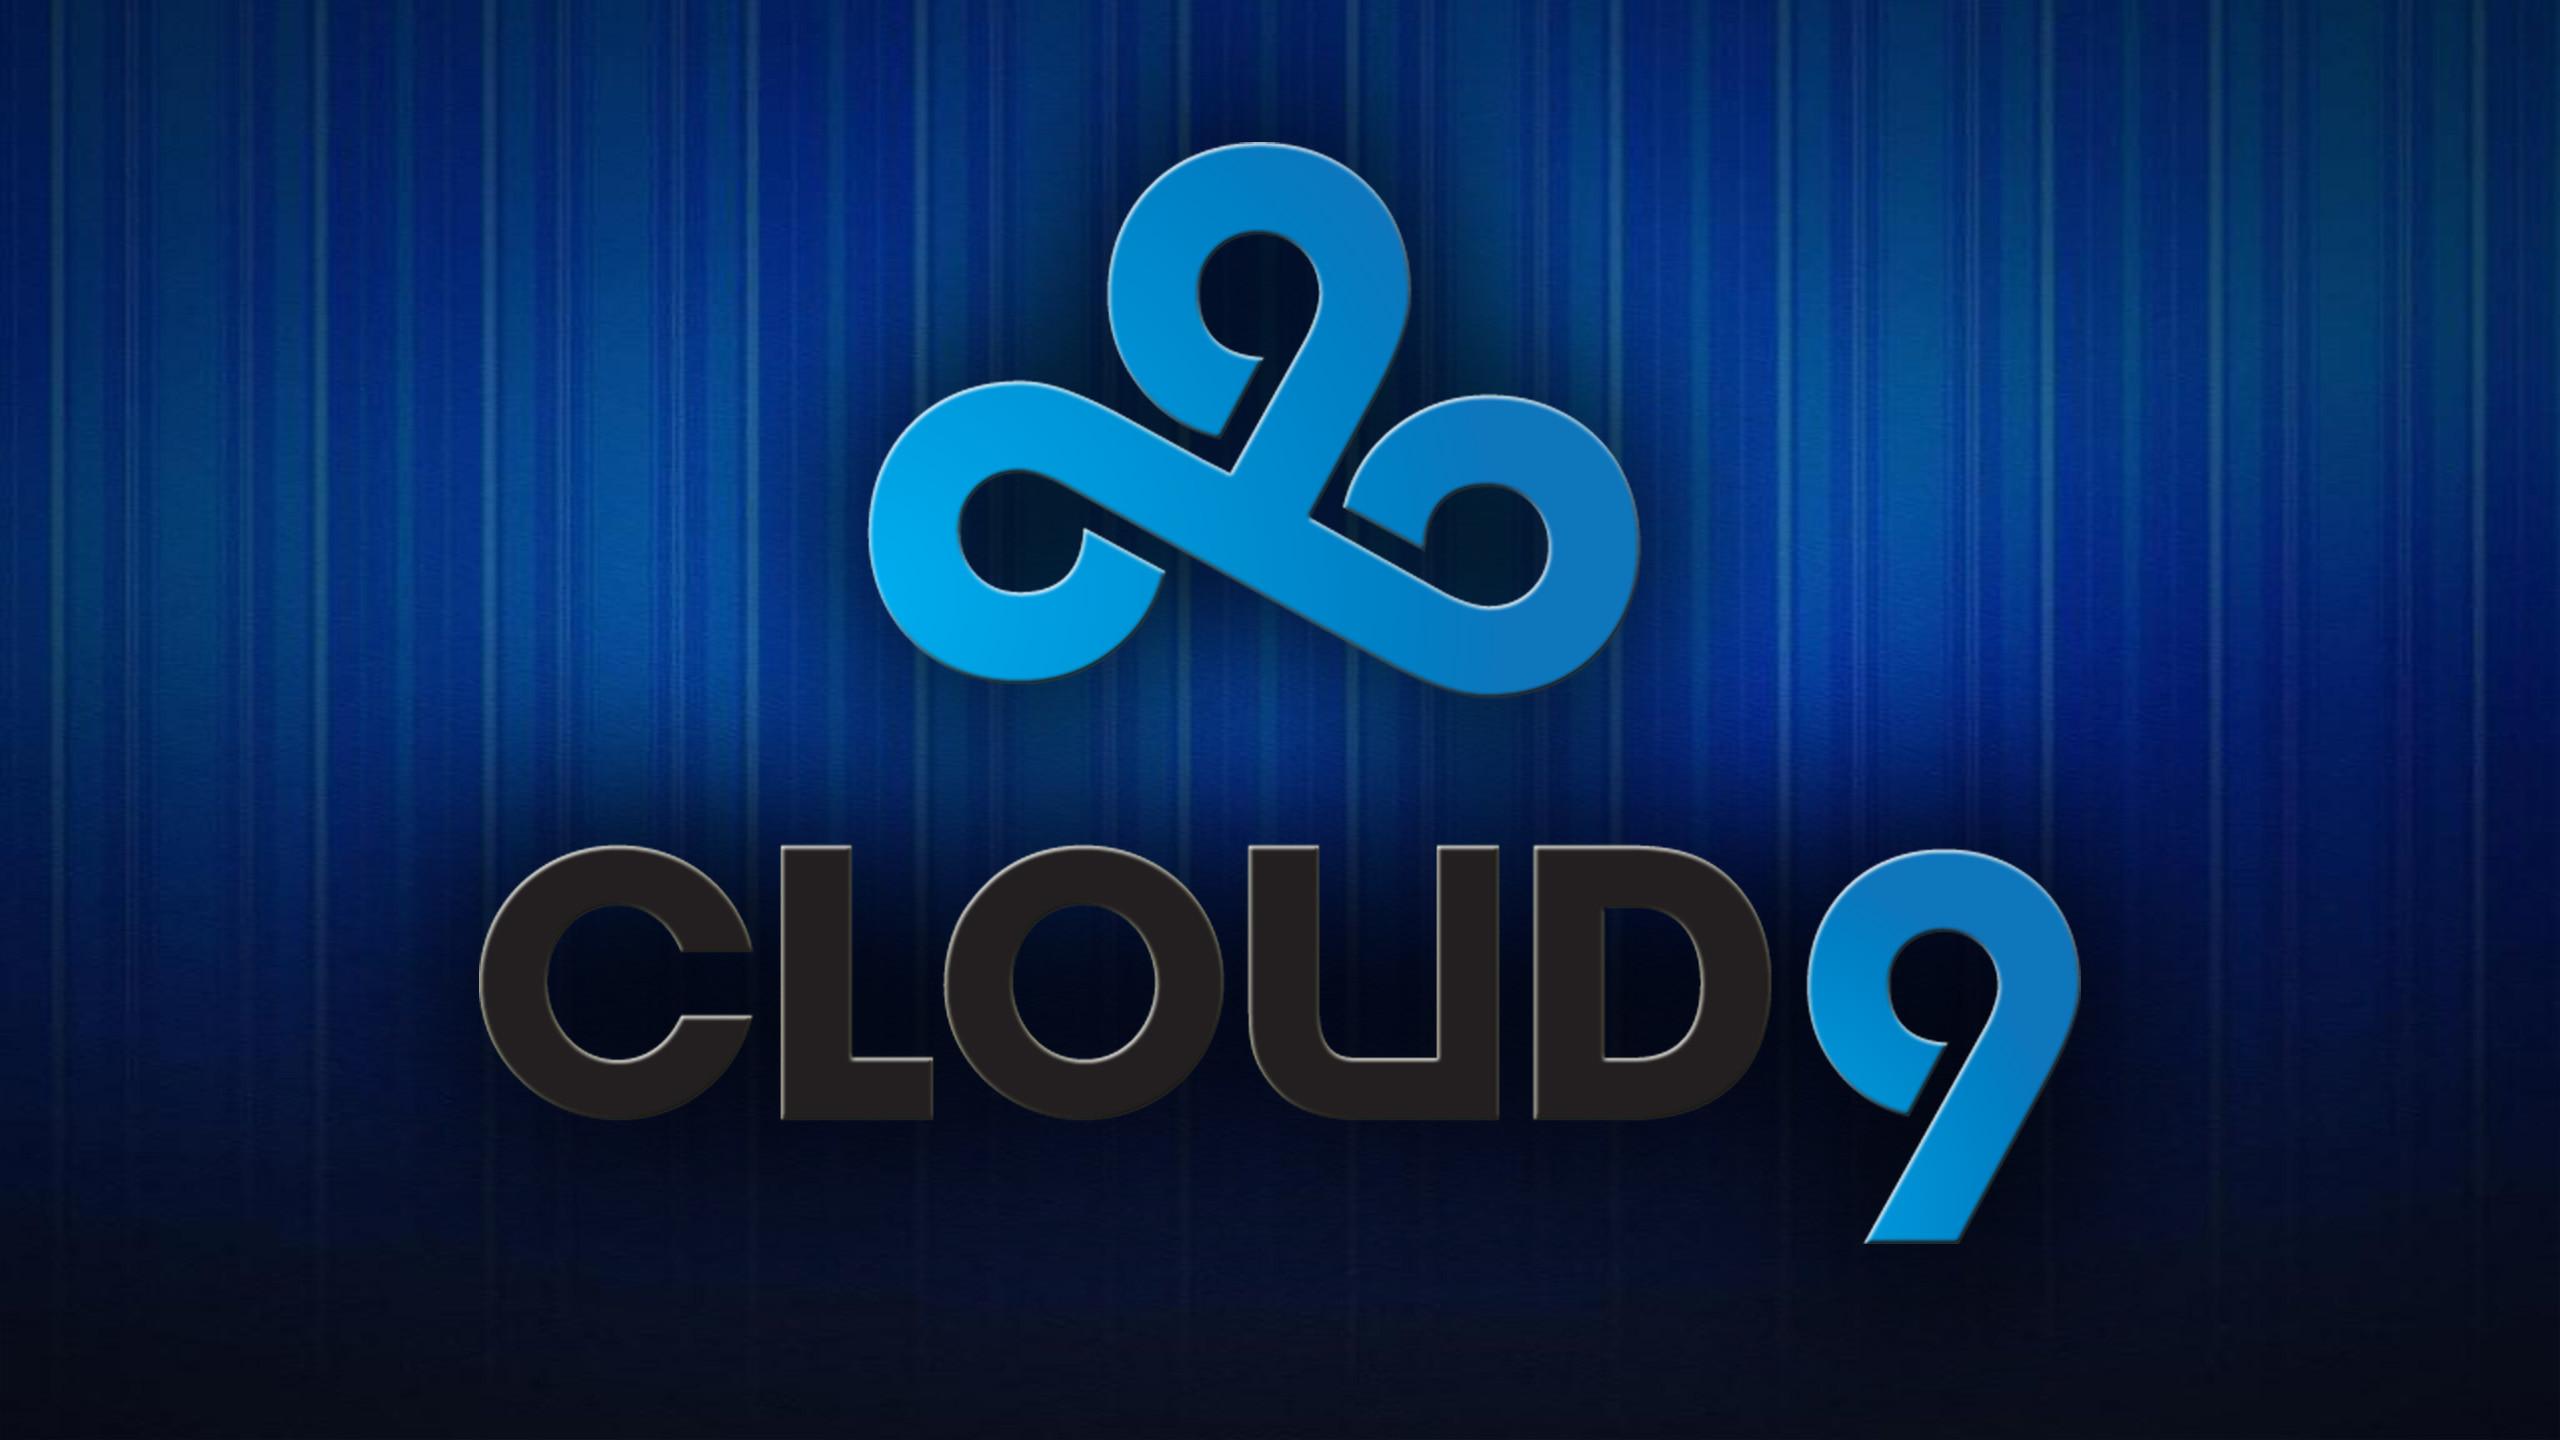 Wallpaper Cloud9 by SpibullRocks Wallpaper Cloud9 by SpibullRocks